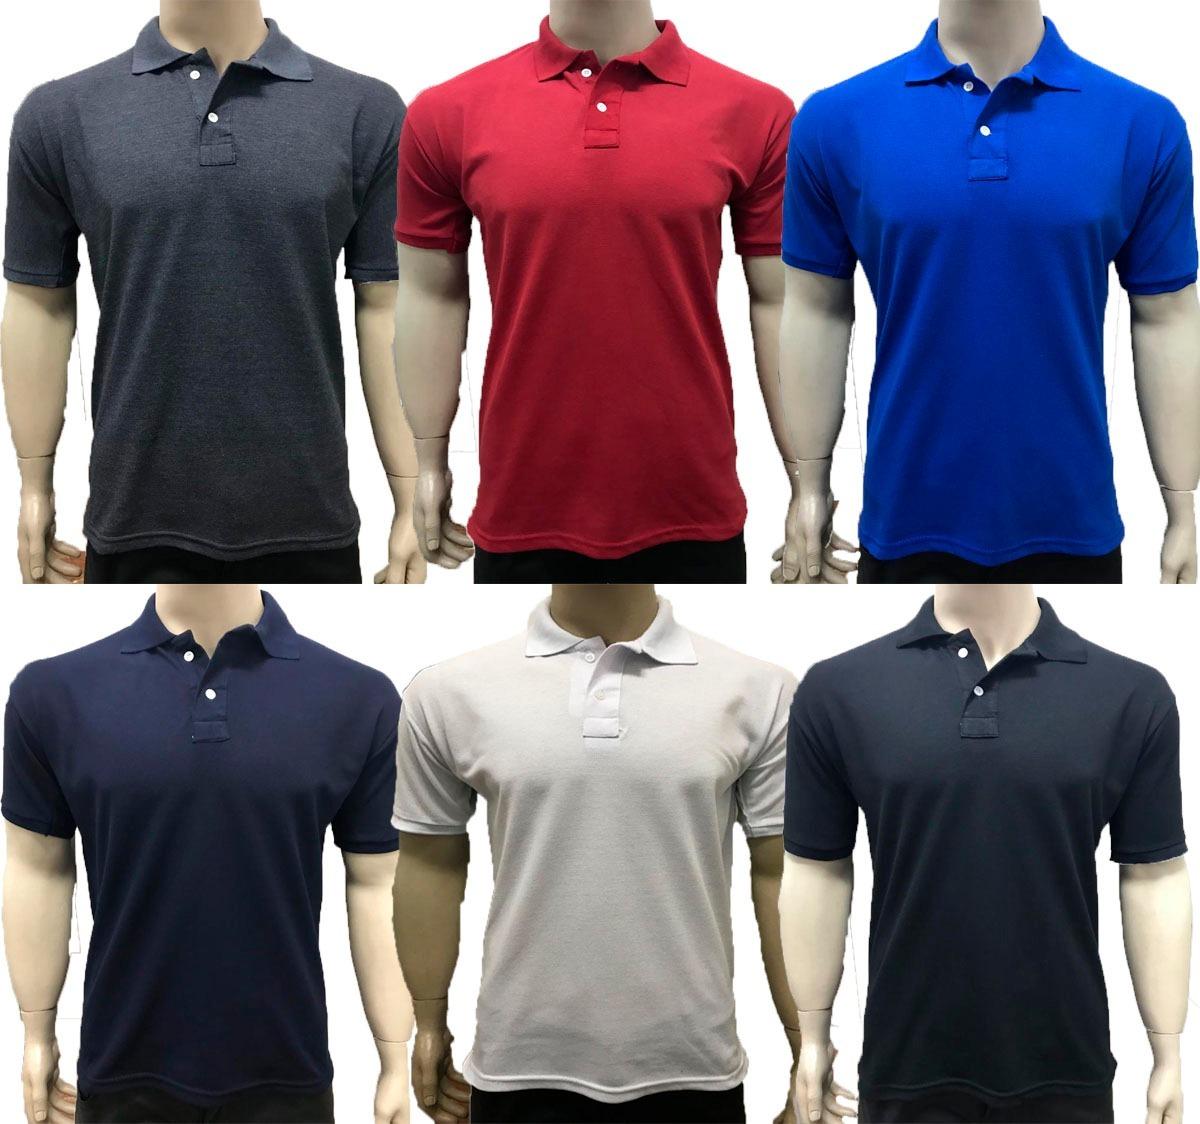 1506d35b19 kit 5 camisas gola polo basica masculina atacado uniforme. Carregando zoom.